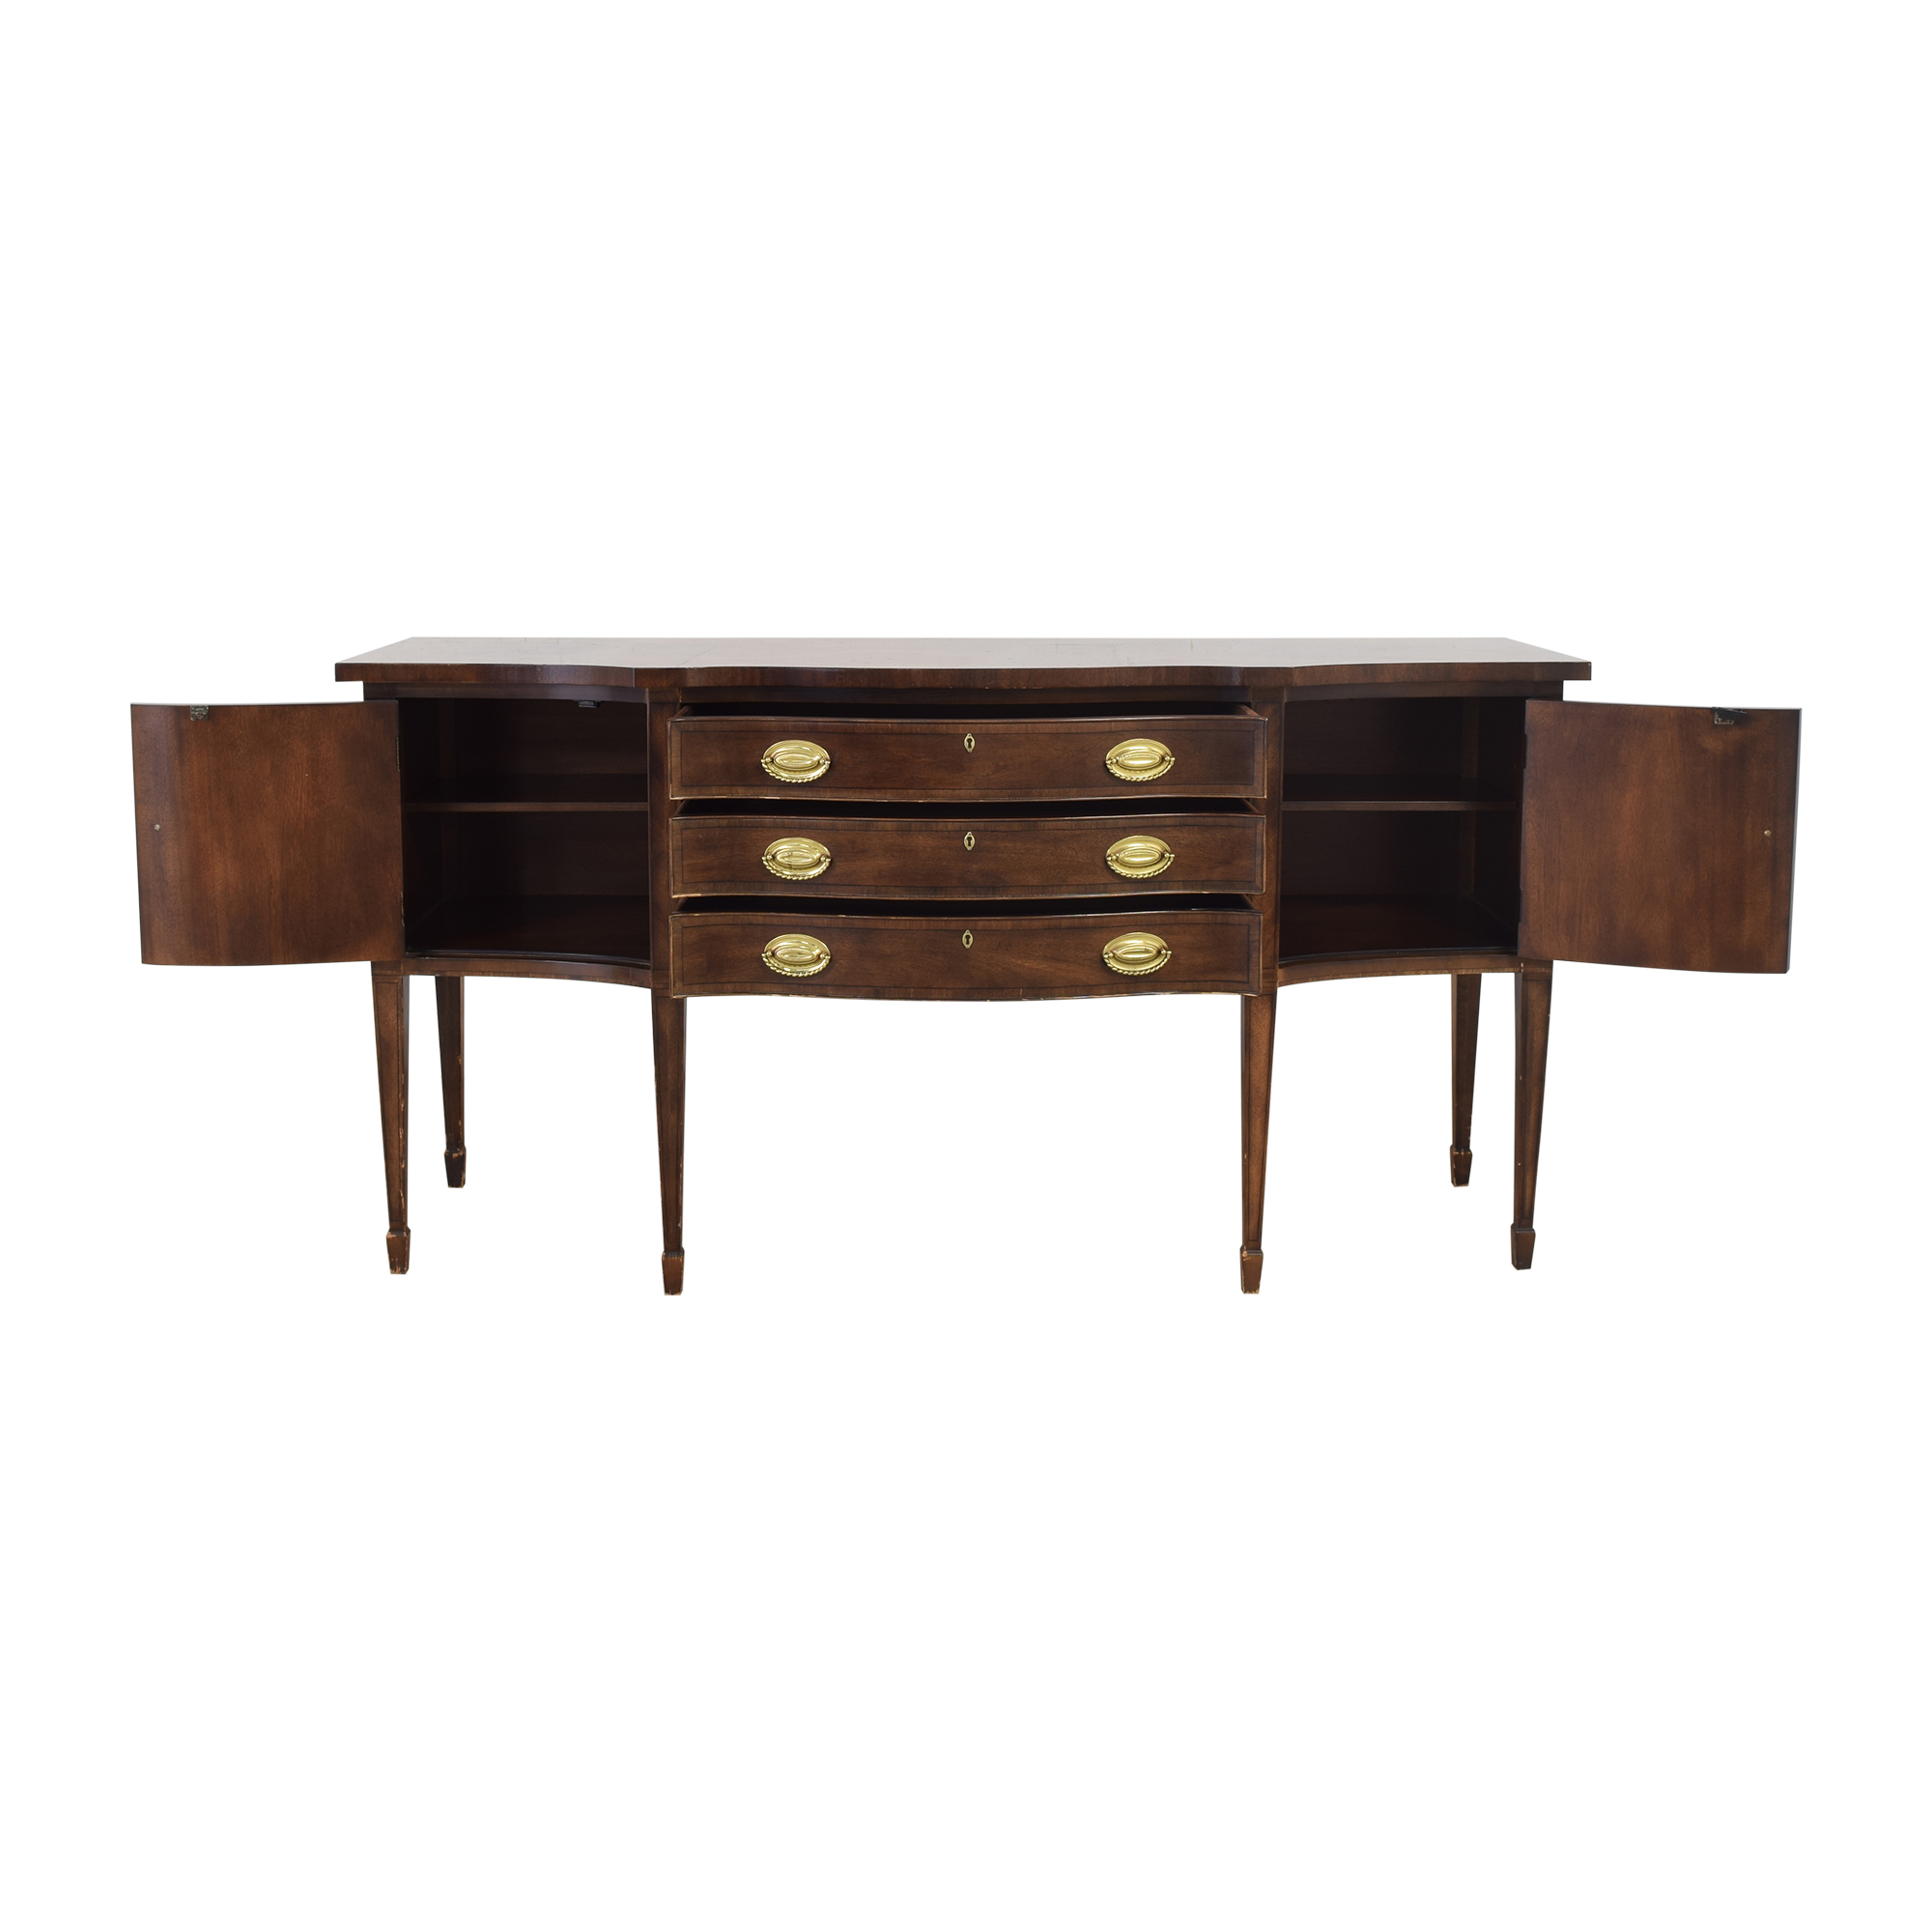 Henredon Furniture Henredon Furniture Rittenhouse Square Sideboard price